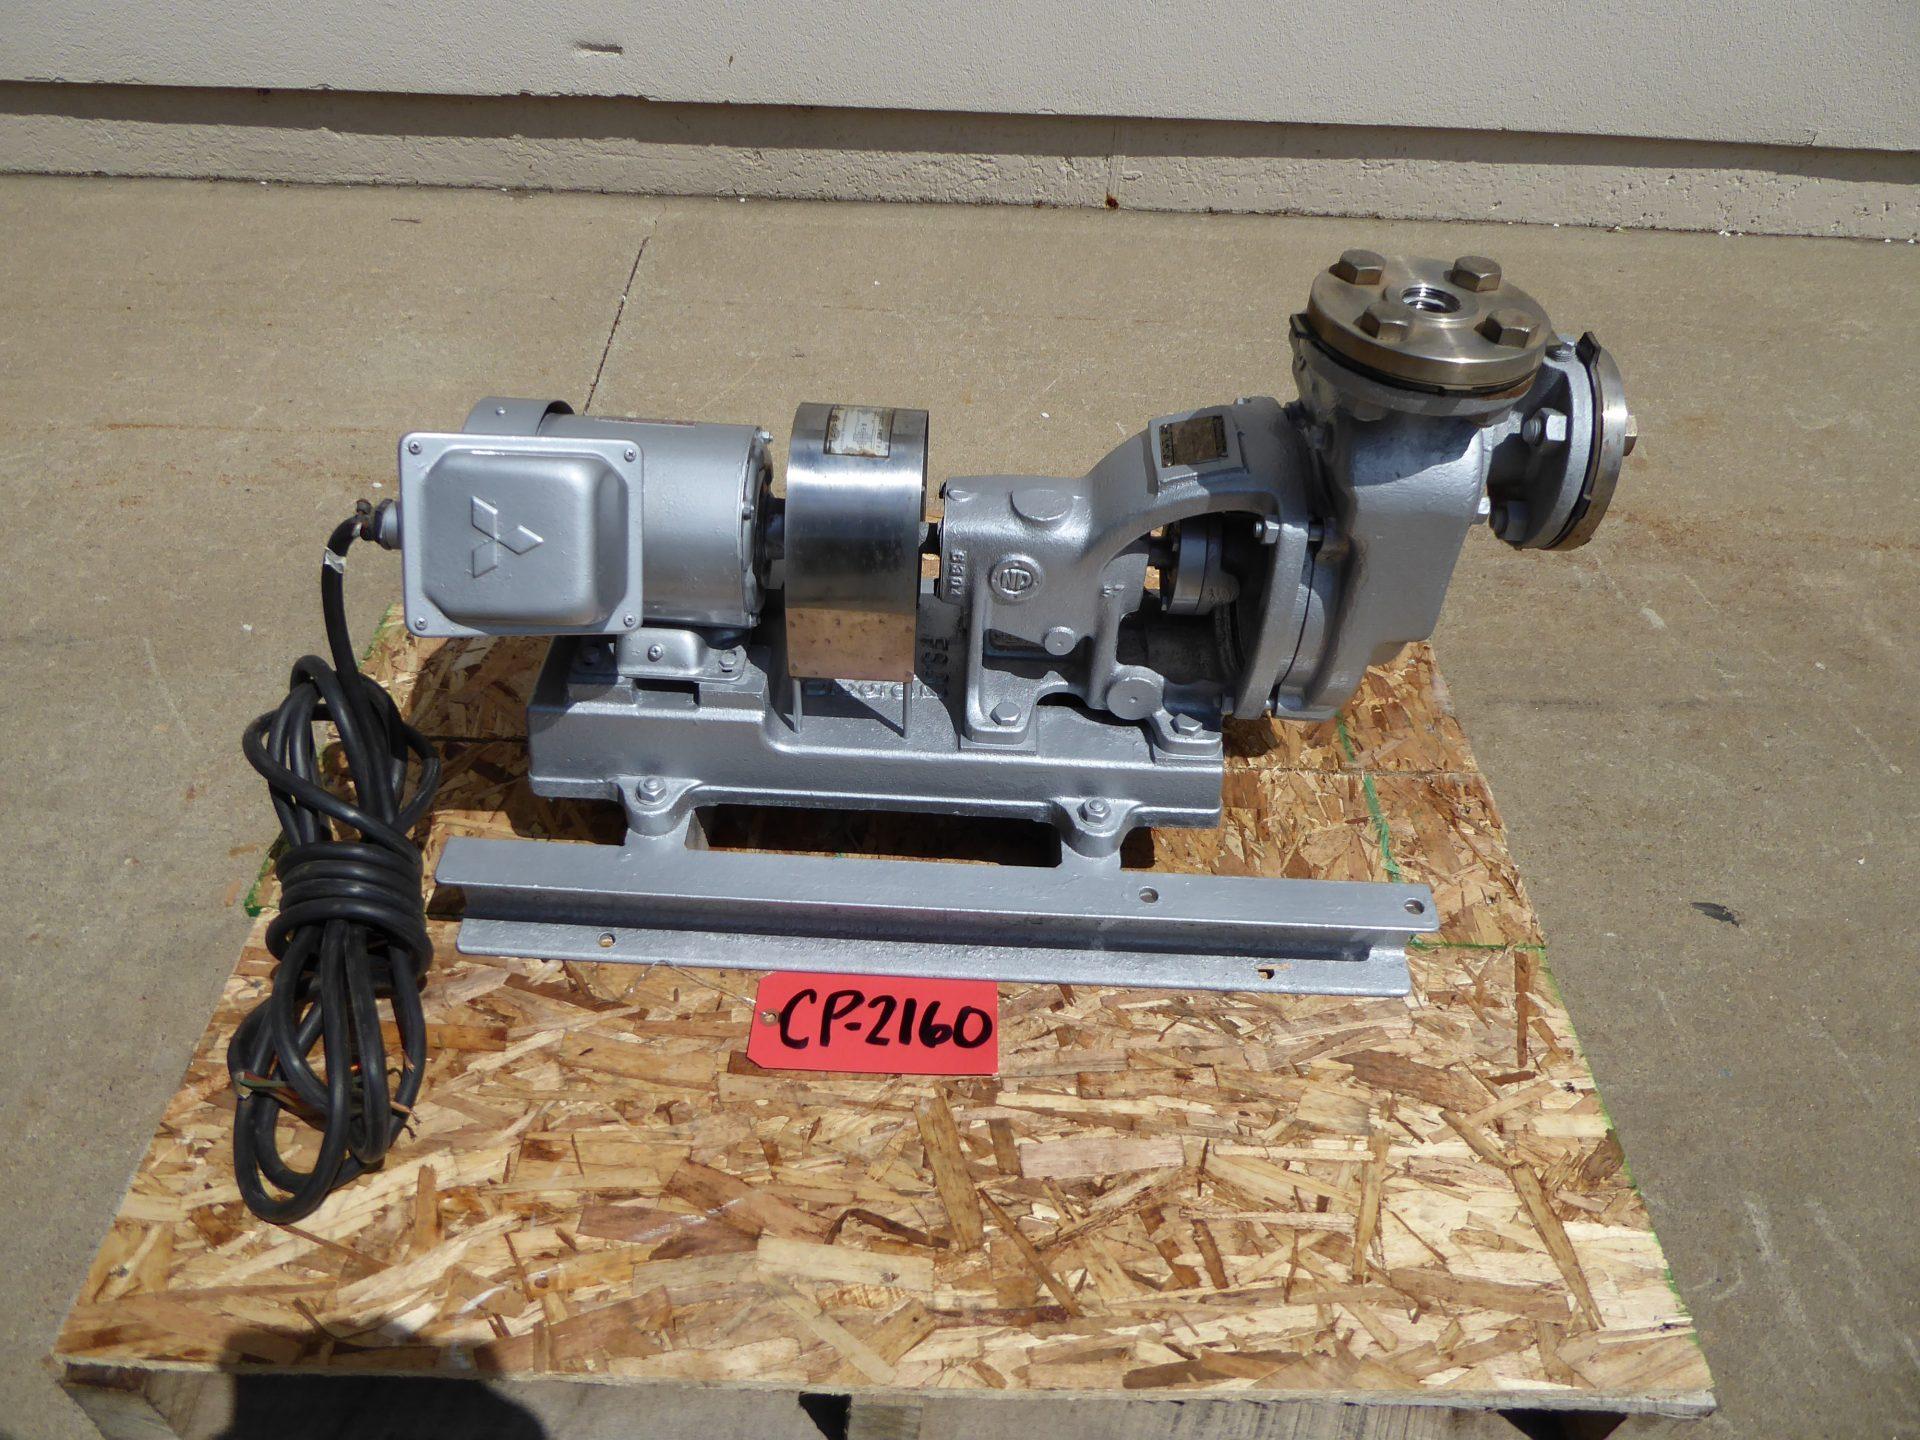 "Used Centrifugal Pump - Nishigaki Pump .5 HP 1"" Inlet 1"" Outlet Centrifugal Pump-Pumps - Centrifugal"